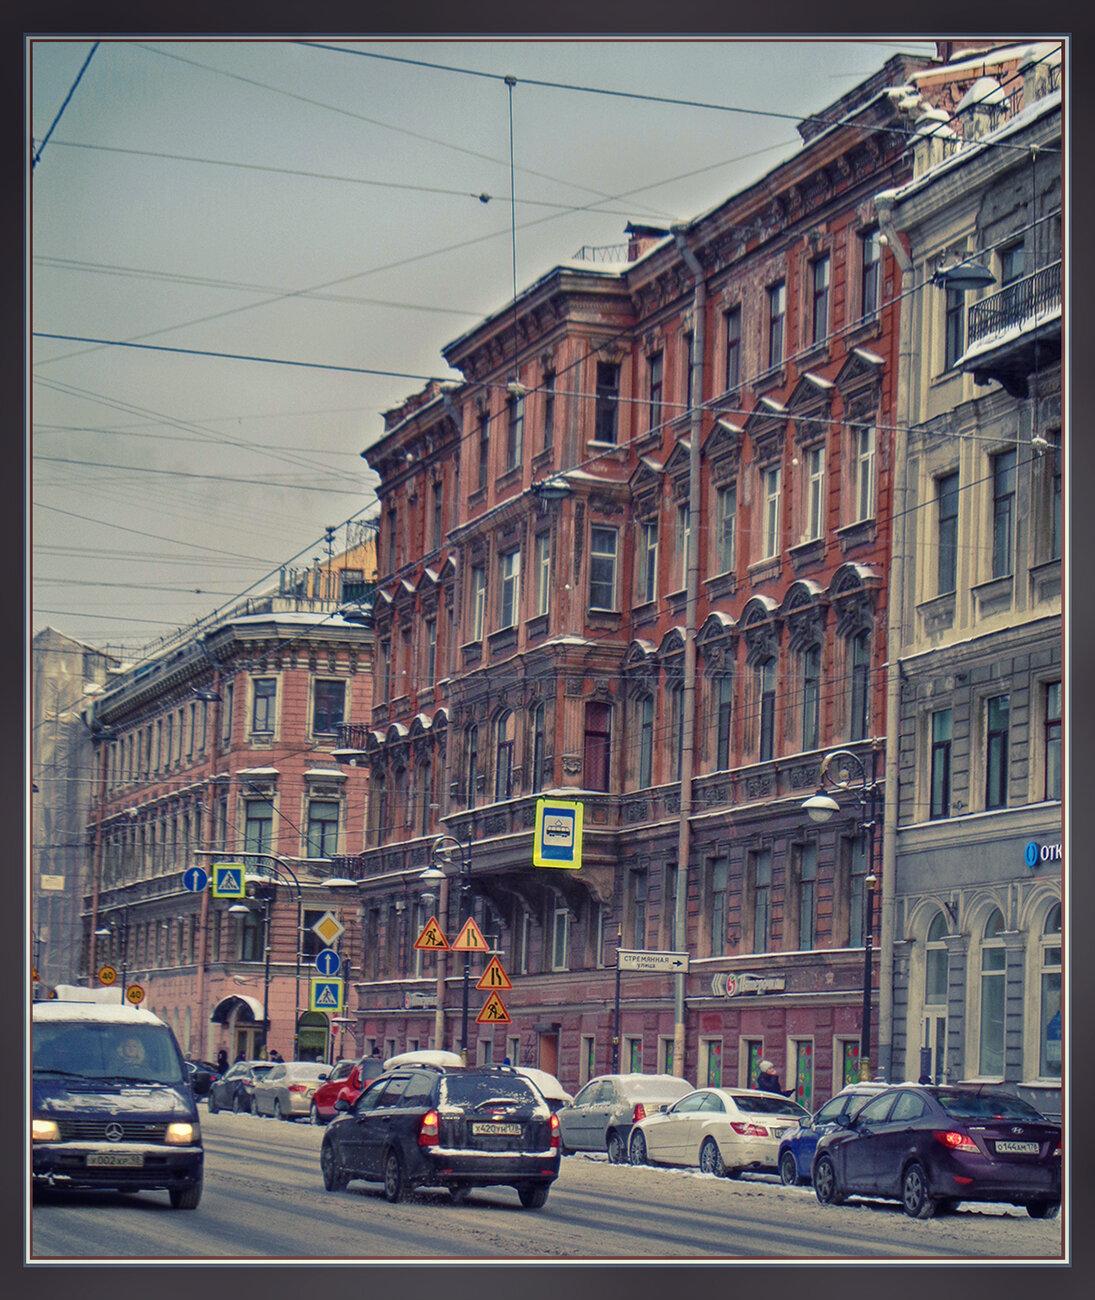 фото владимирского проспекта в питере монтажа